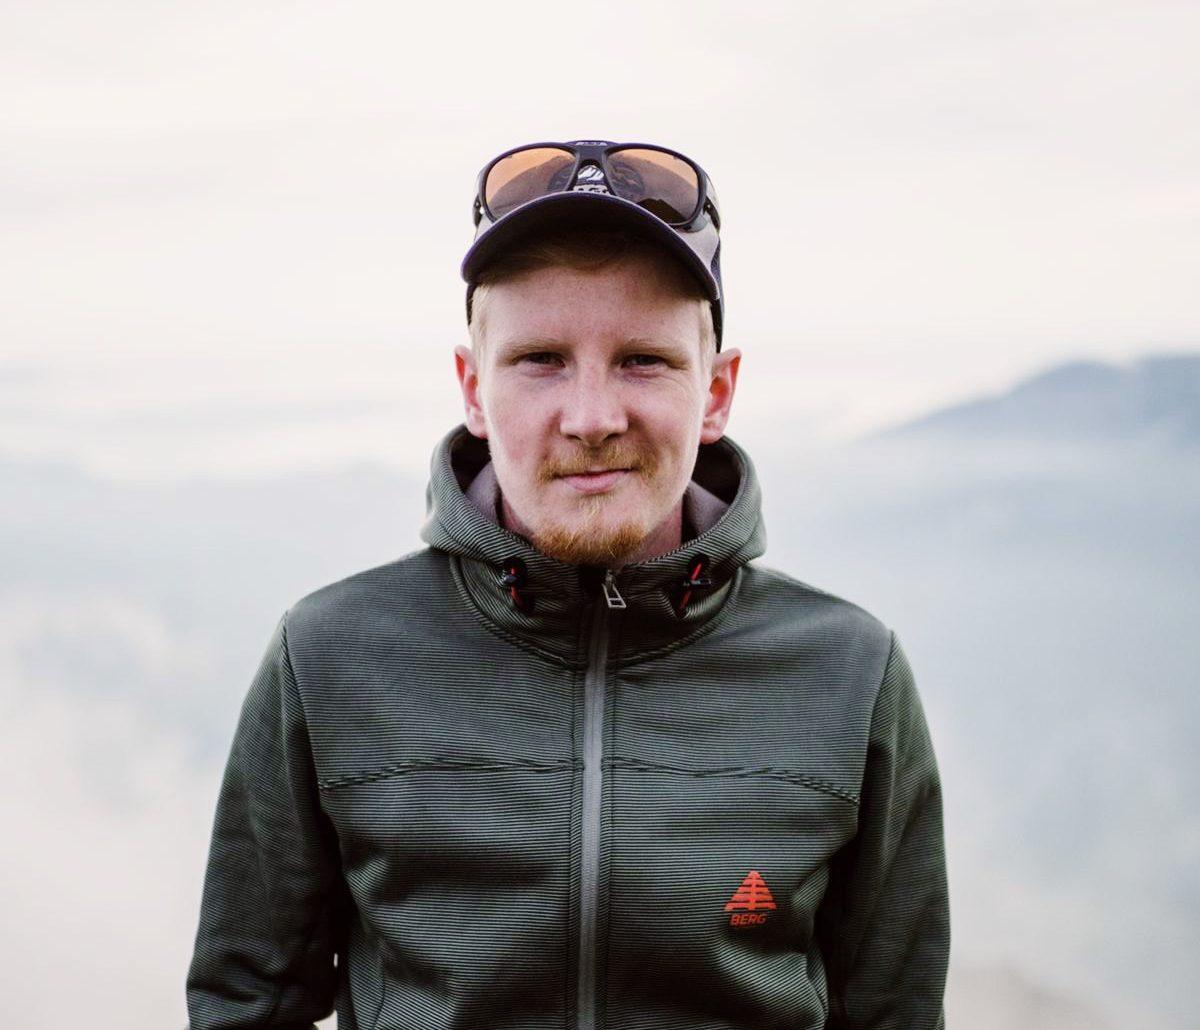 Interview with photographer Konsta Punkka (kpunkka)